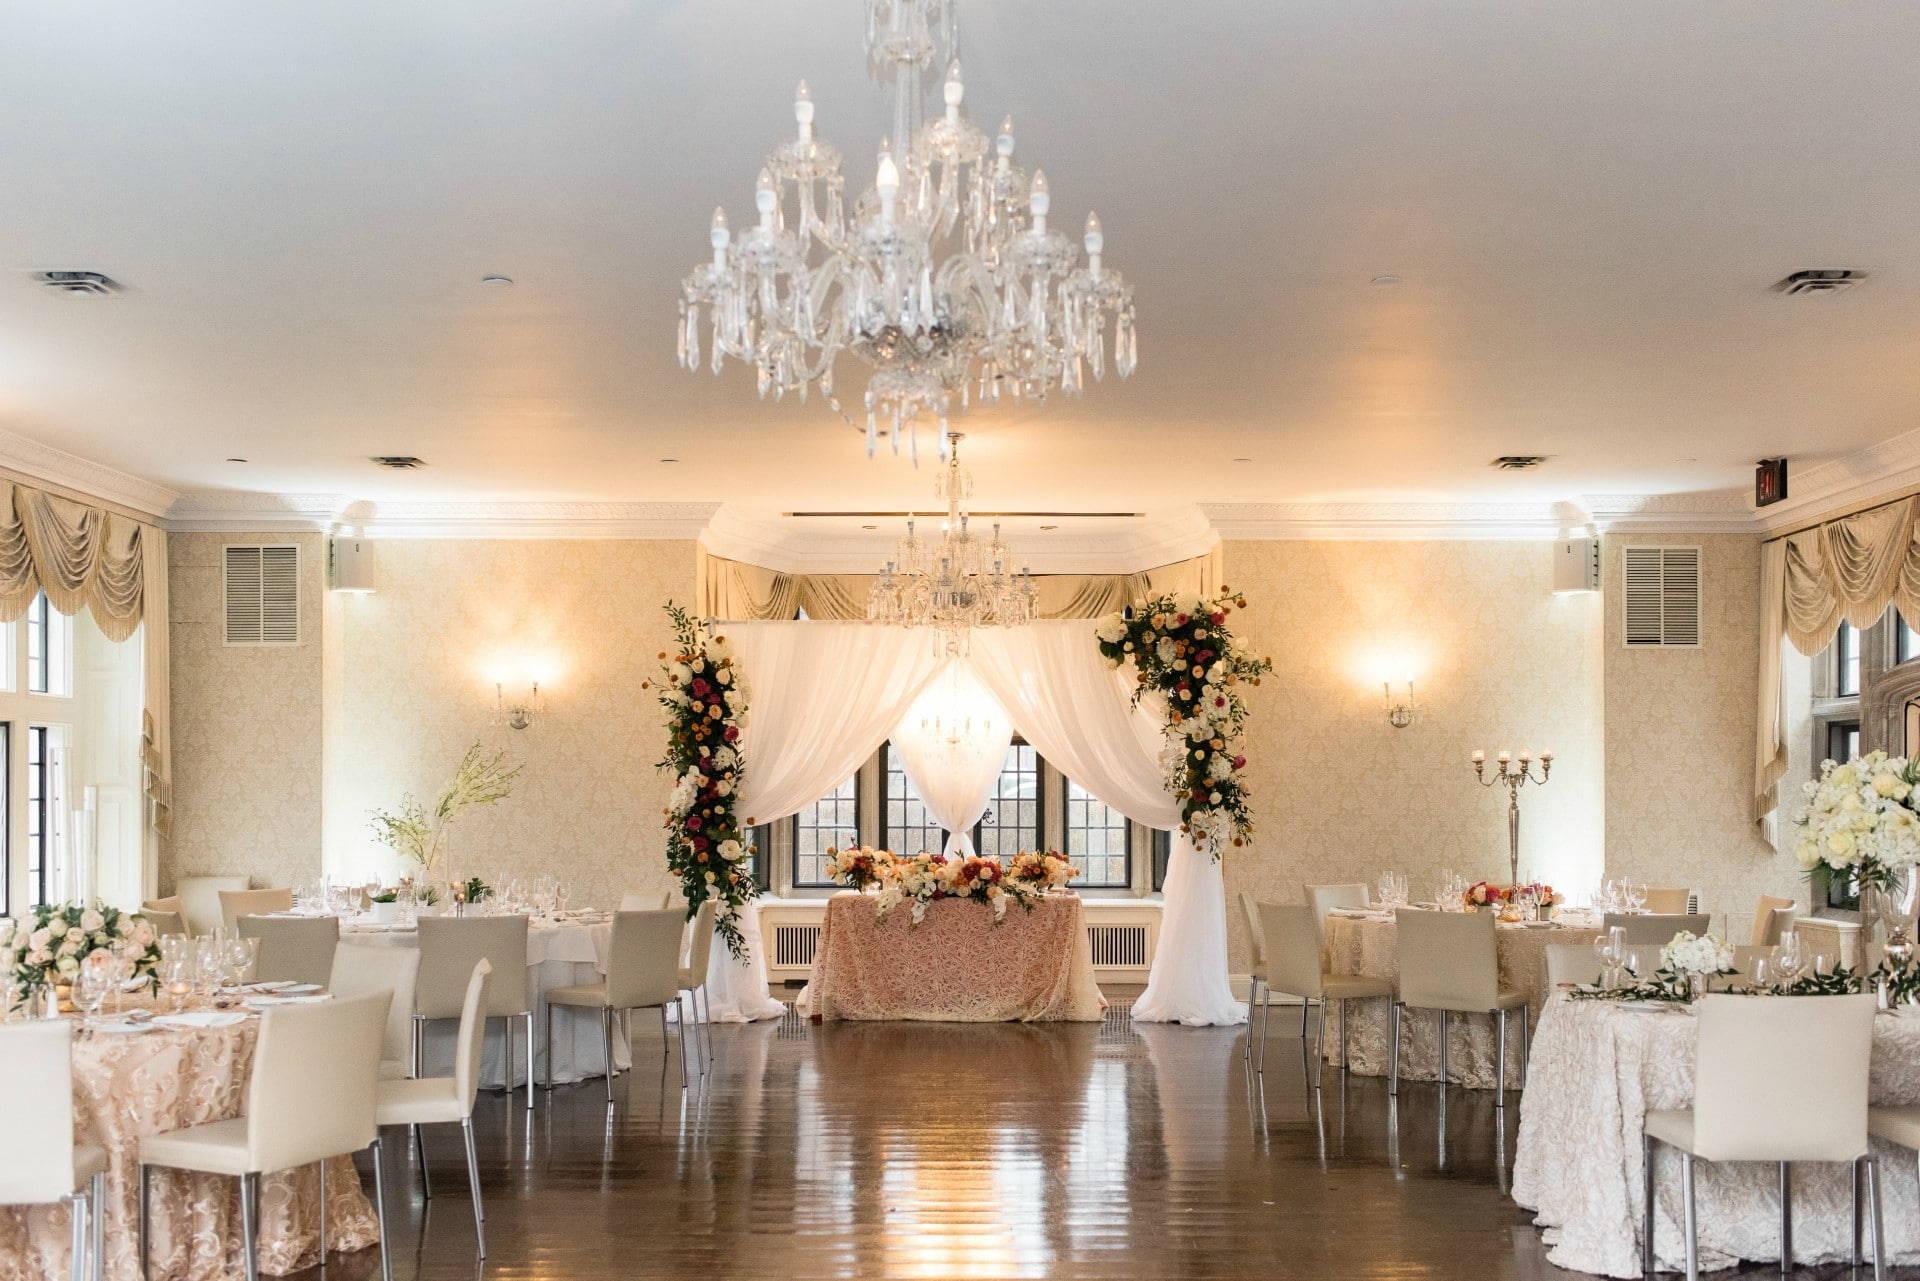 Hero image for Estates of Sunnybrook's 2017 Bridal Open House